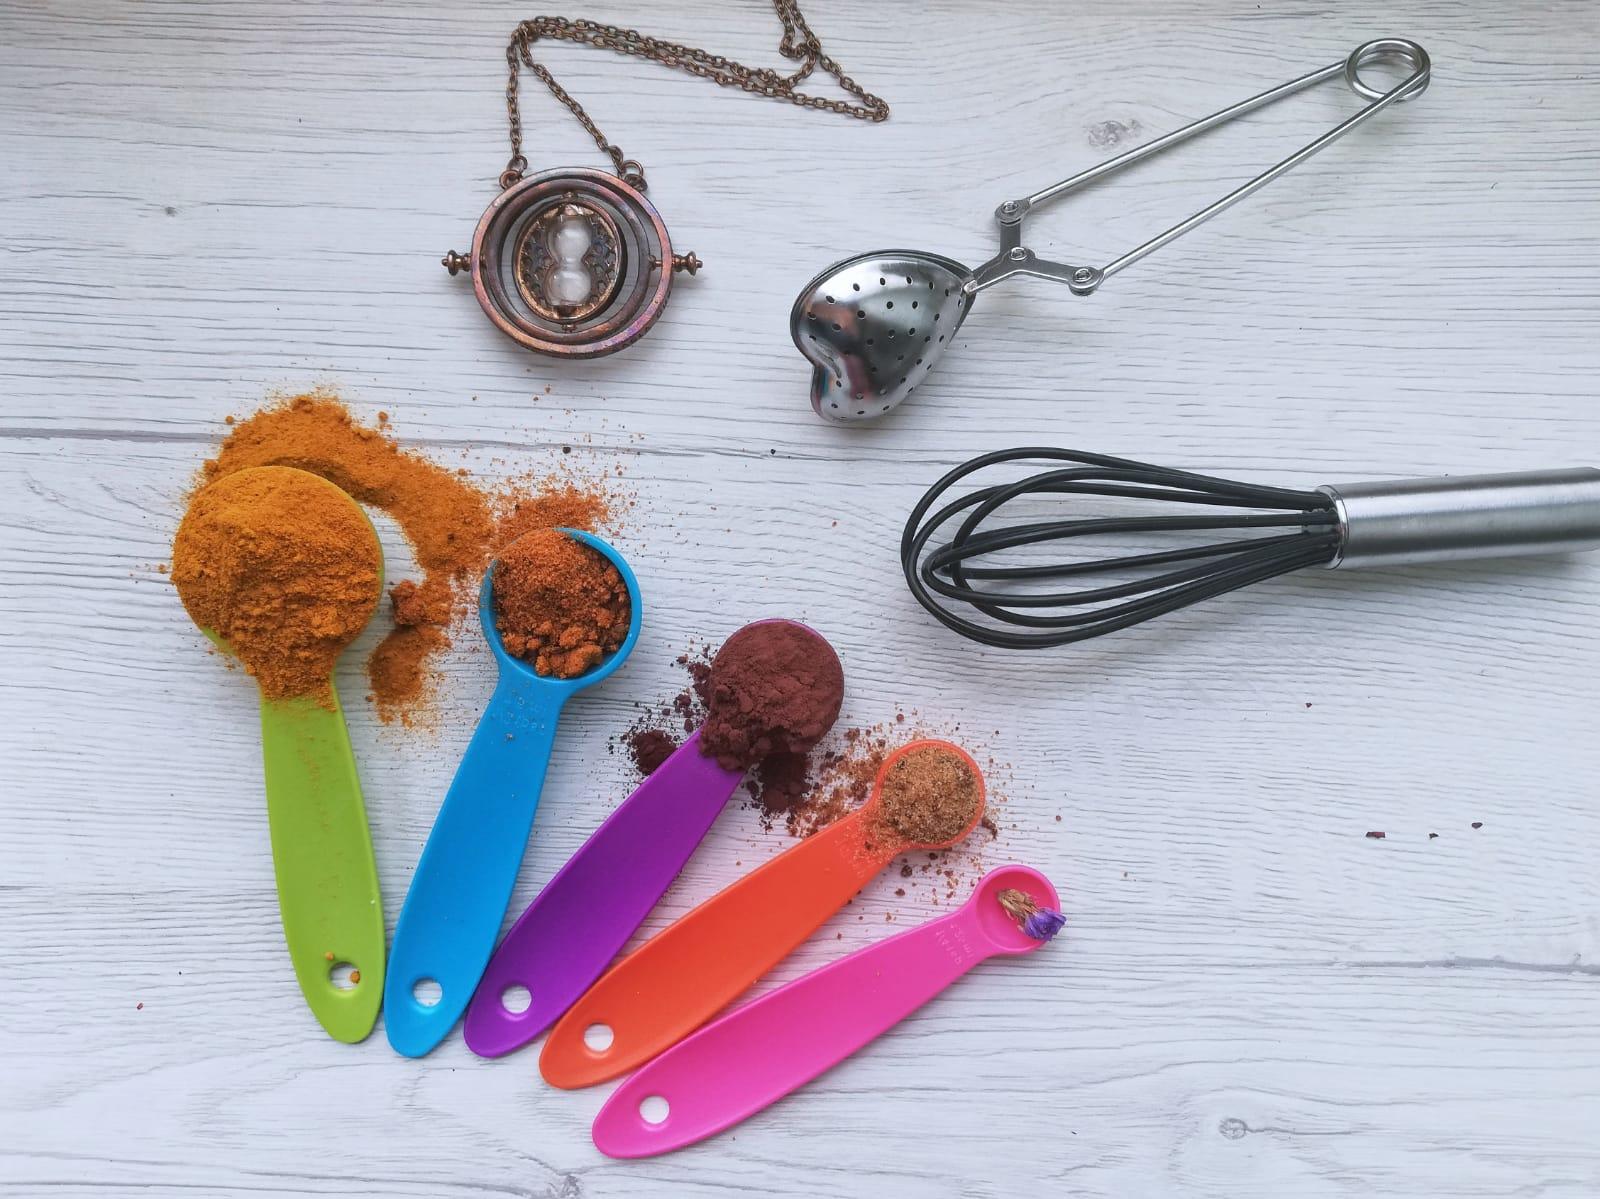 corso di mindful eating e mindful cooking a torino corso di cucina